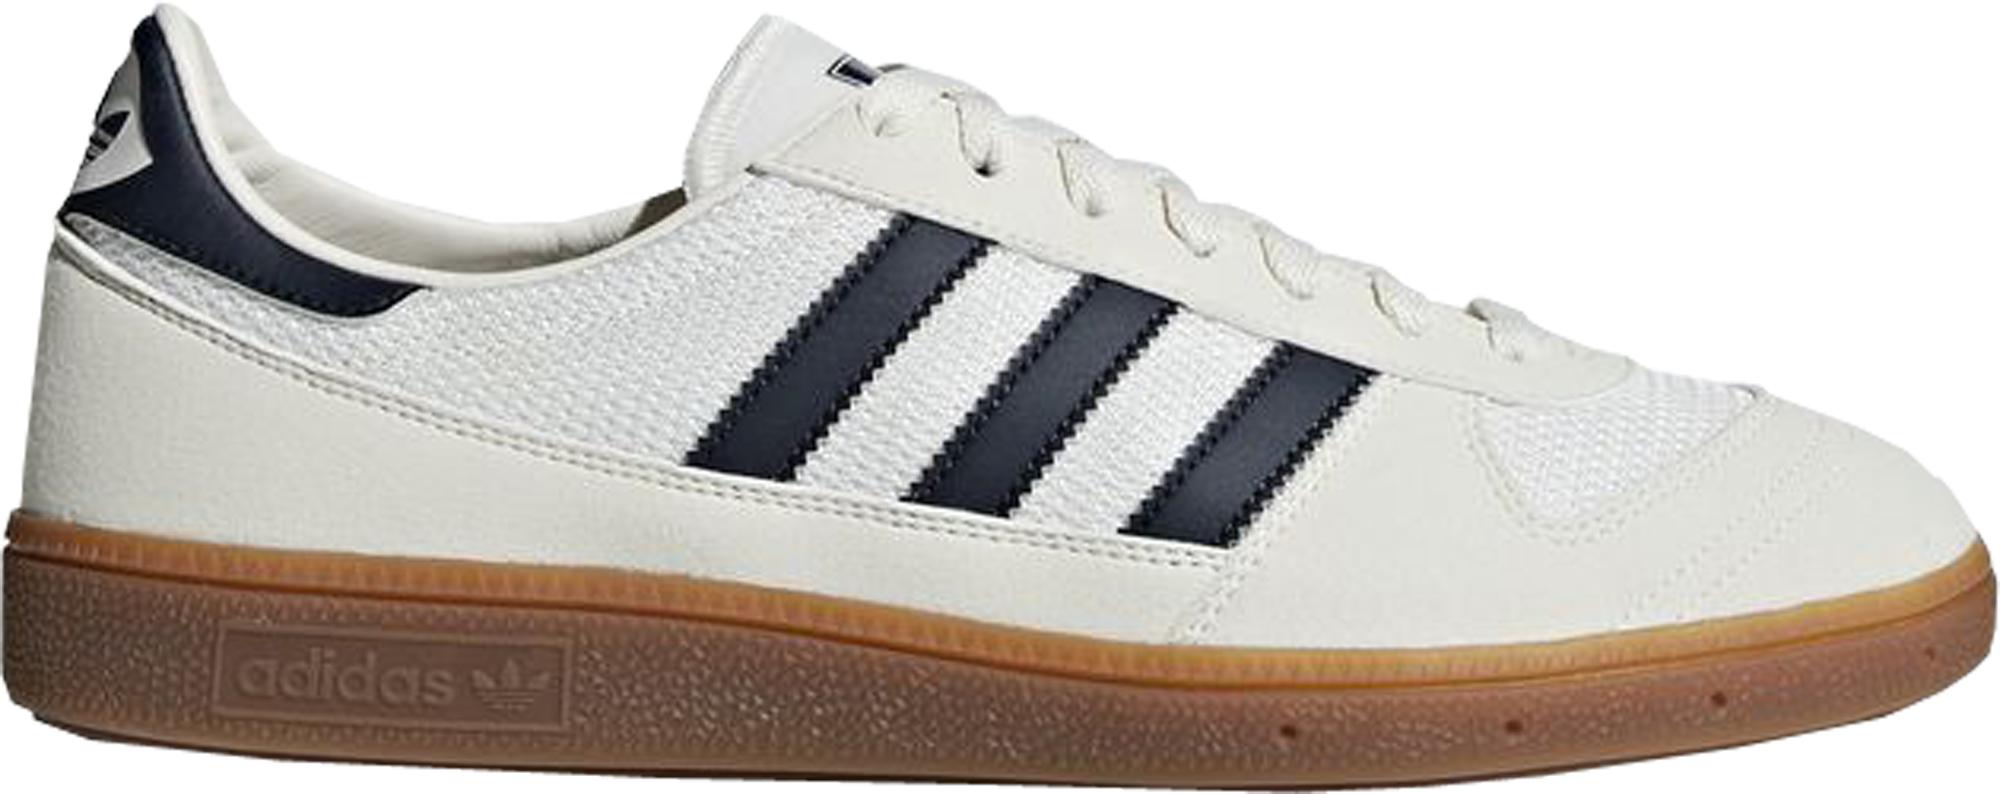 adidas Wilsy Spezial Off White Night Navy